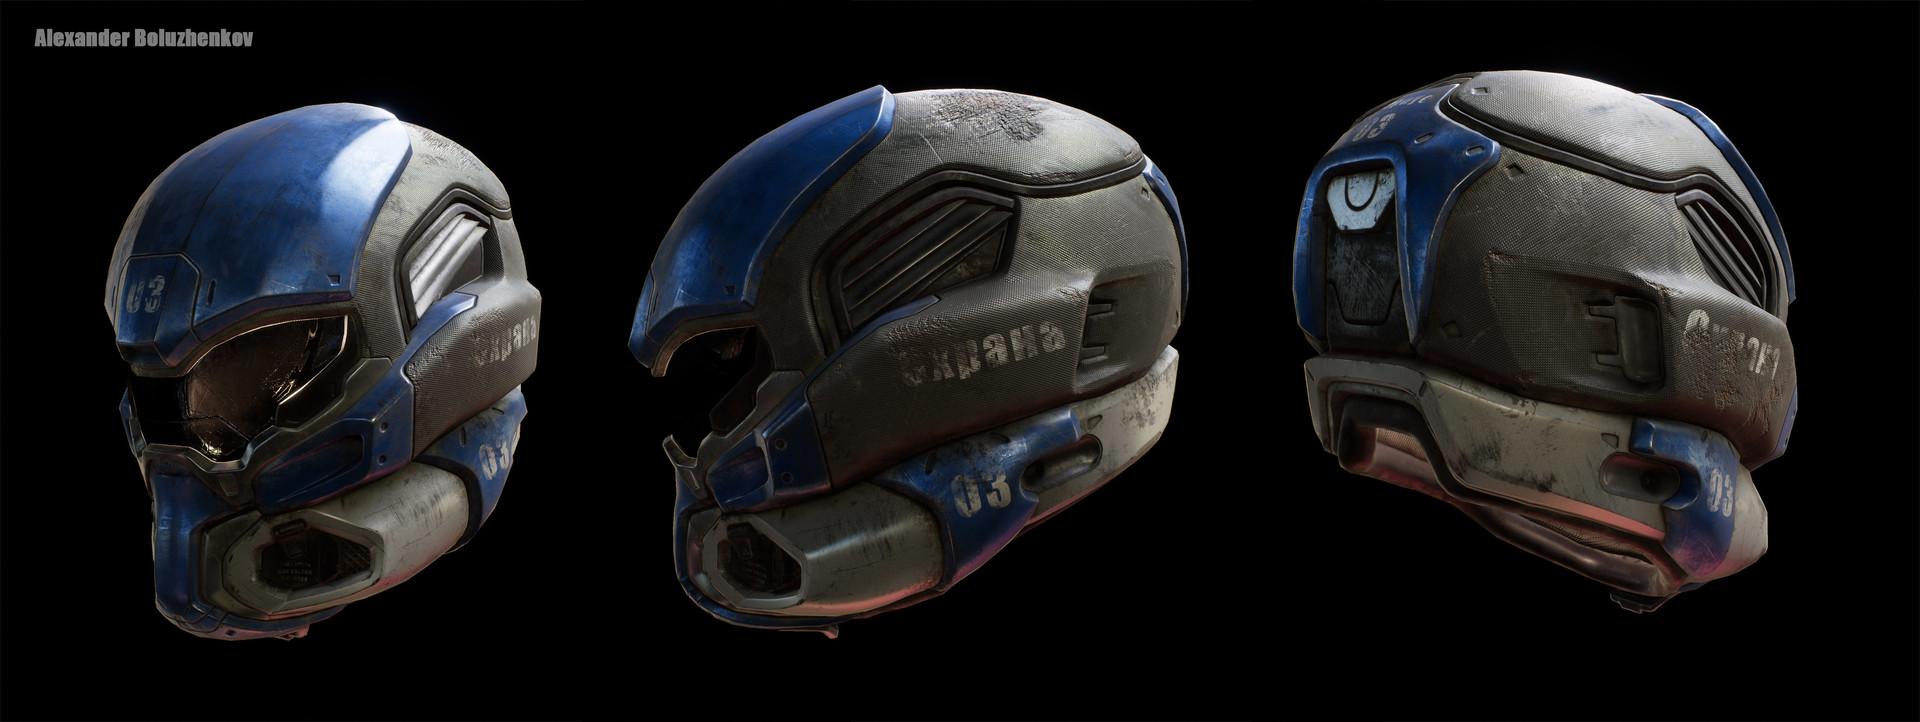 Alexander boluzhenkov helmet lowpoly